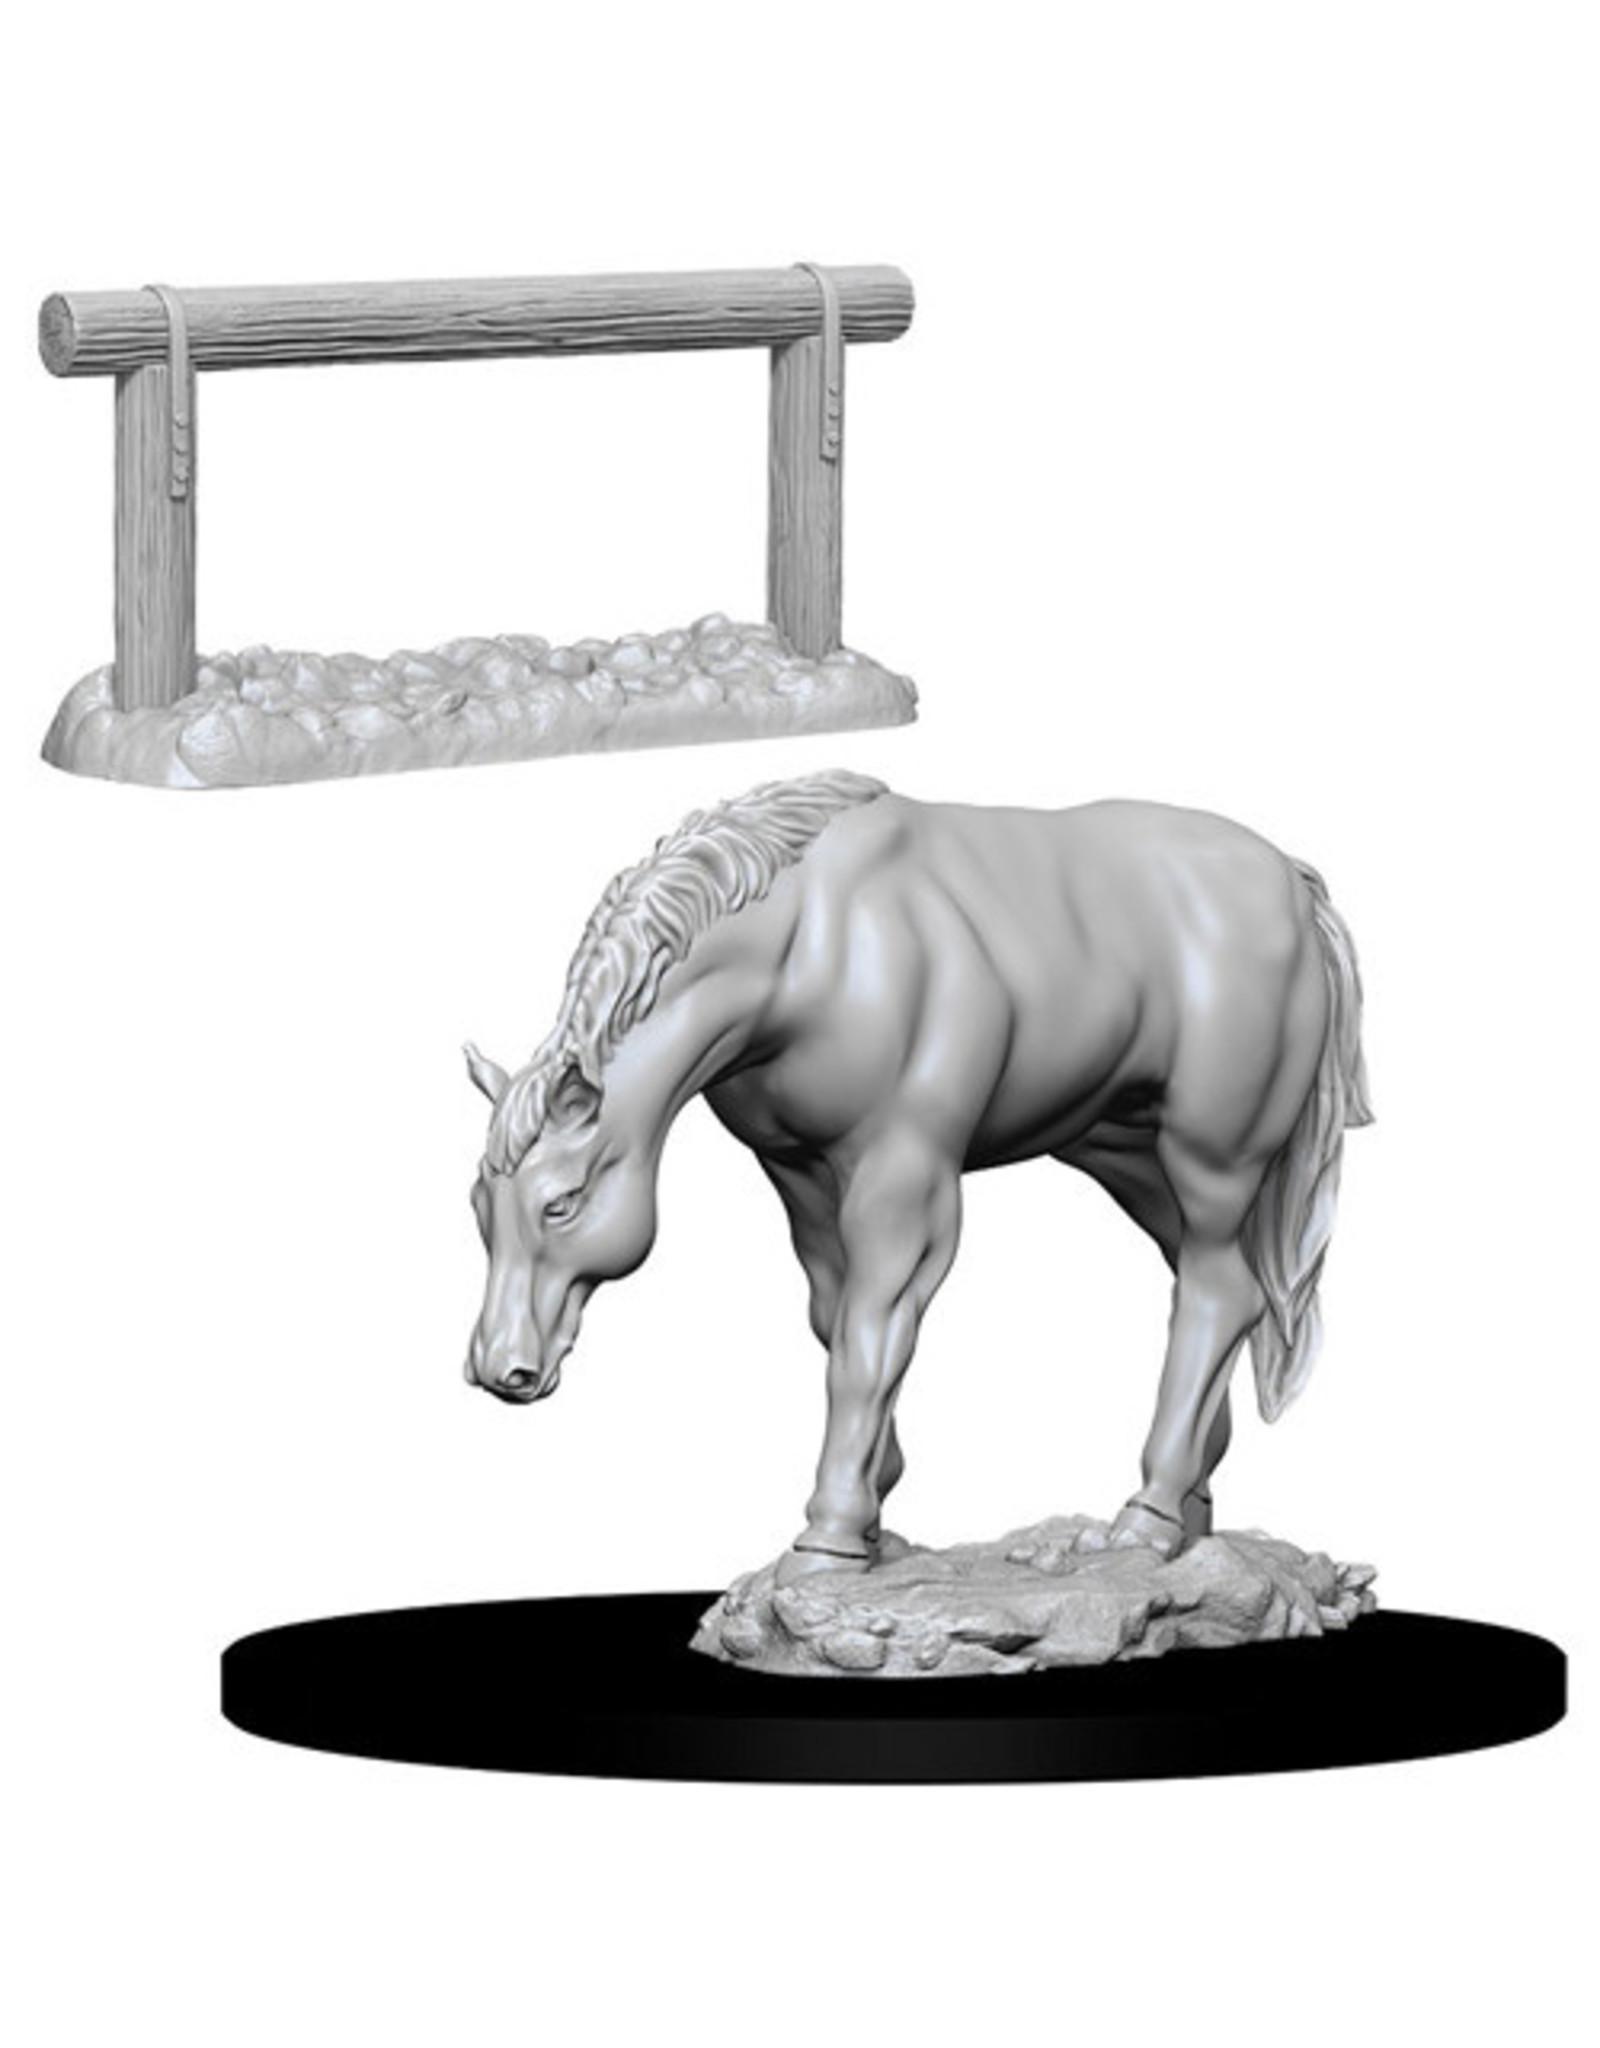 WIZKIDS DEEP CUTS UNPAINTED MINIS HORSE & HITCH